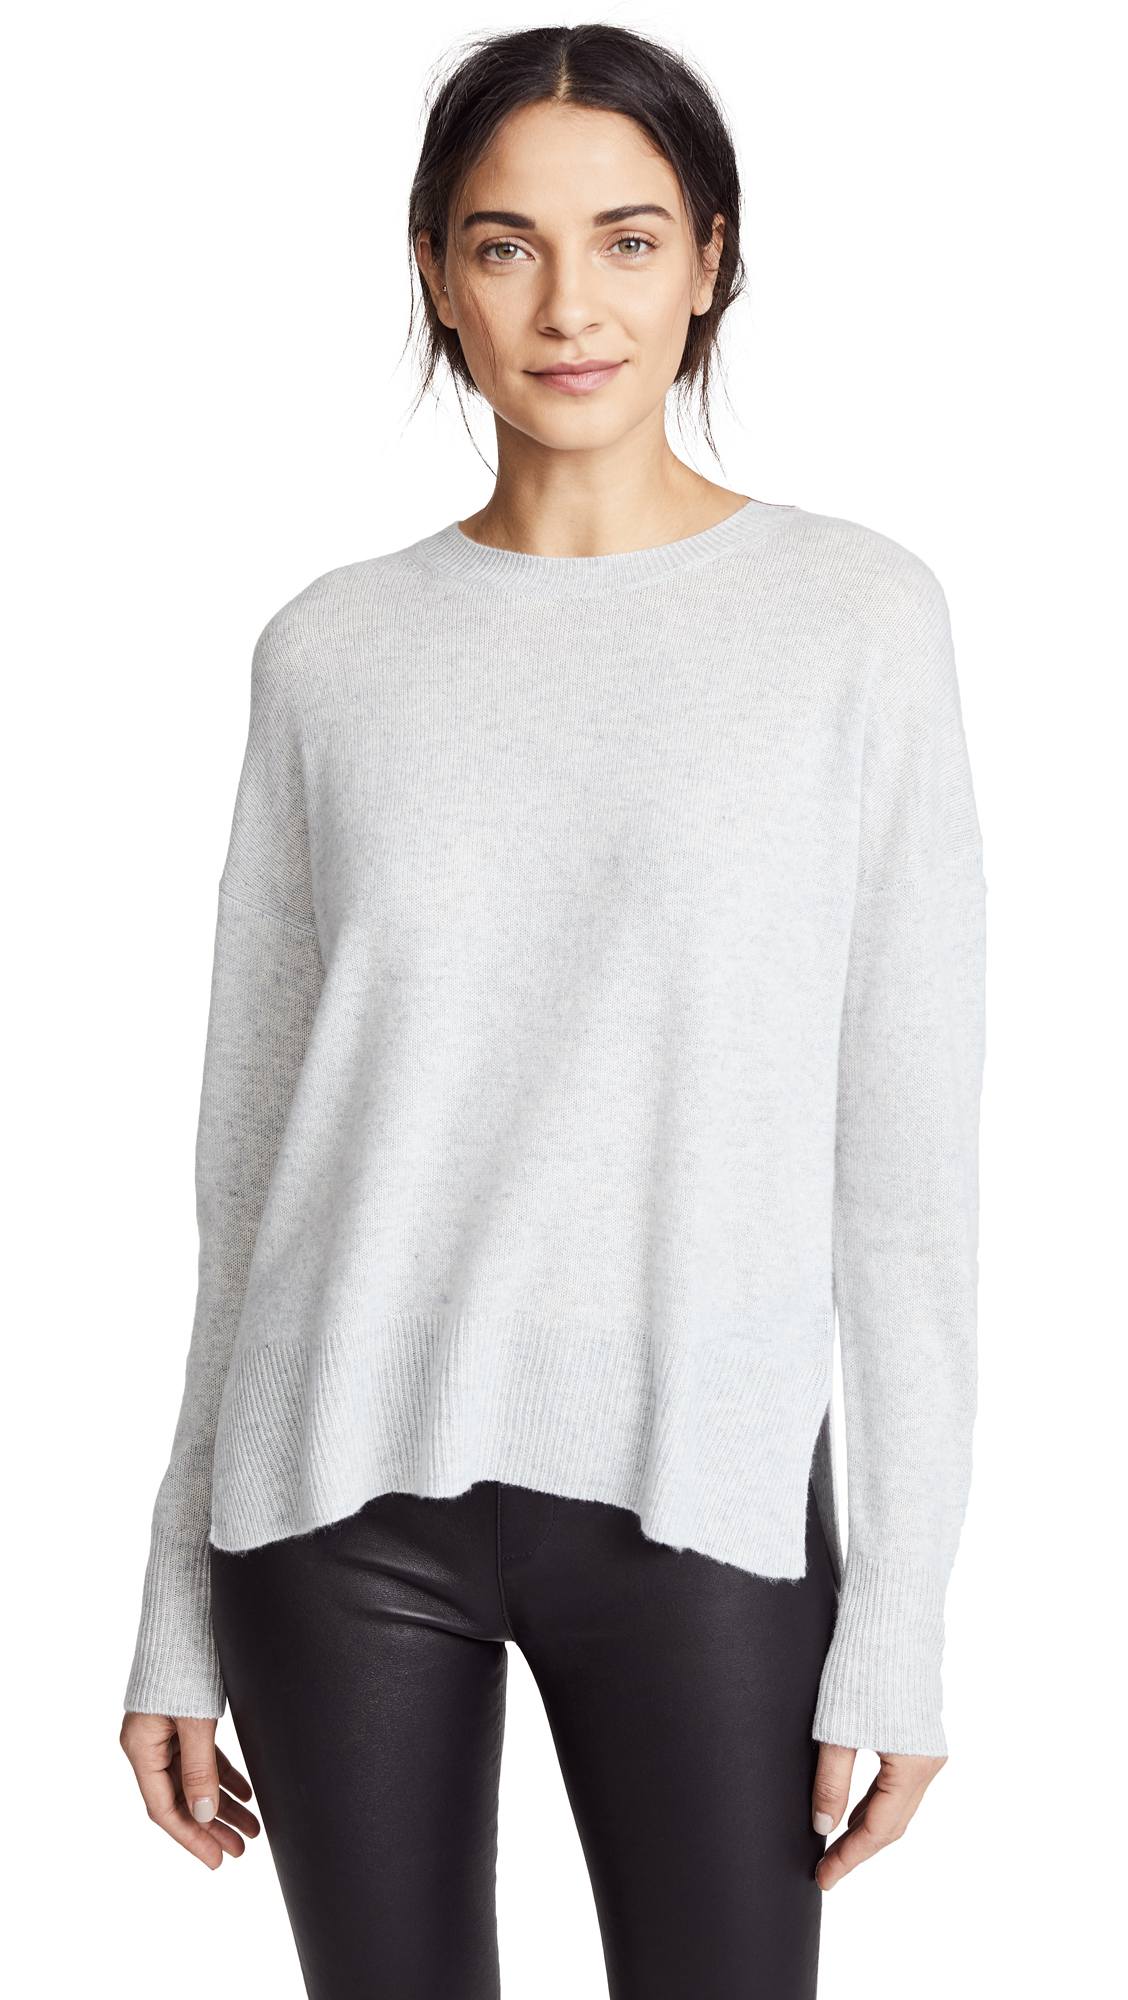 Theory Karenia Cashmere Sweater - Whale Grey